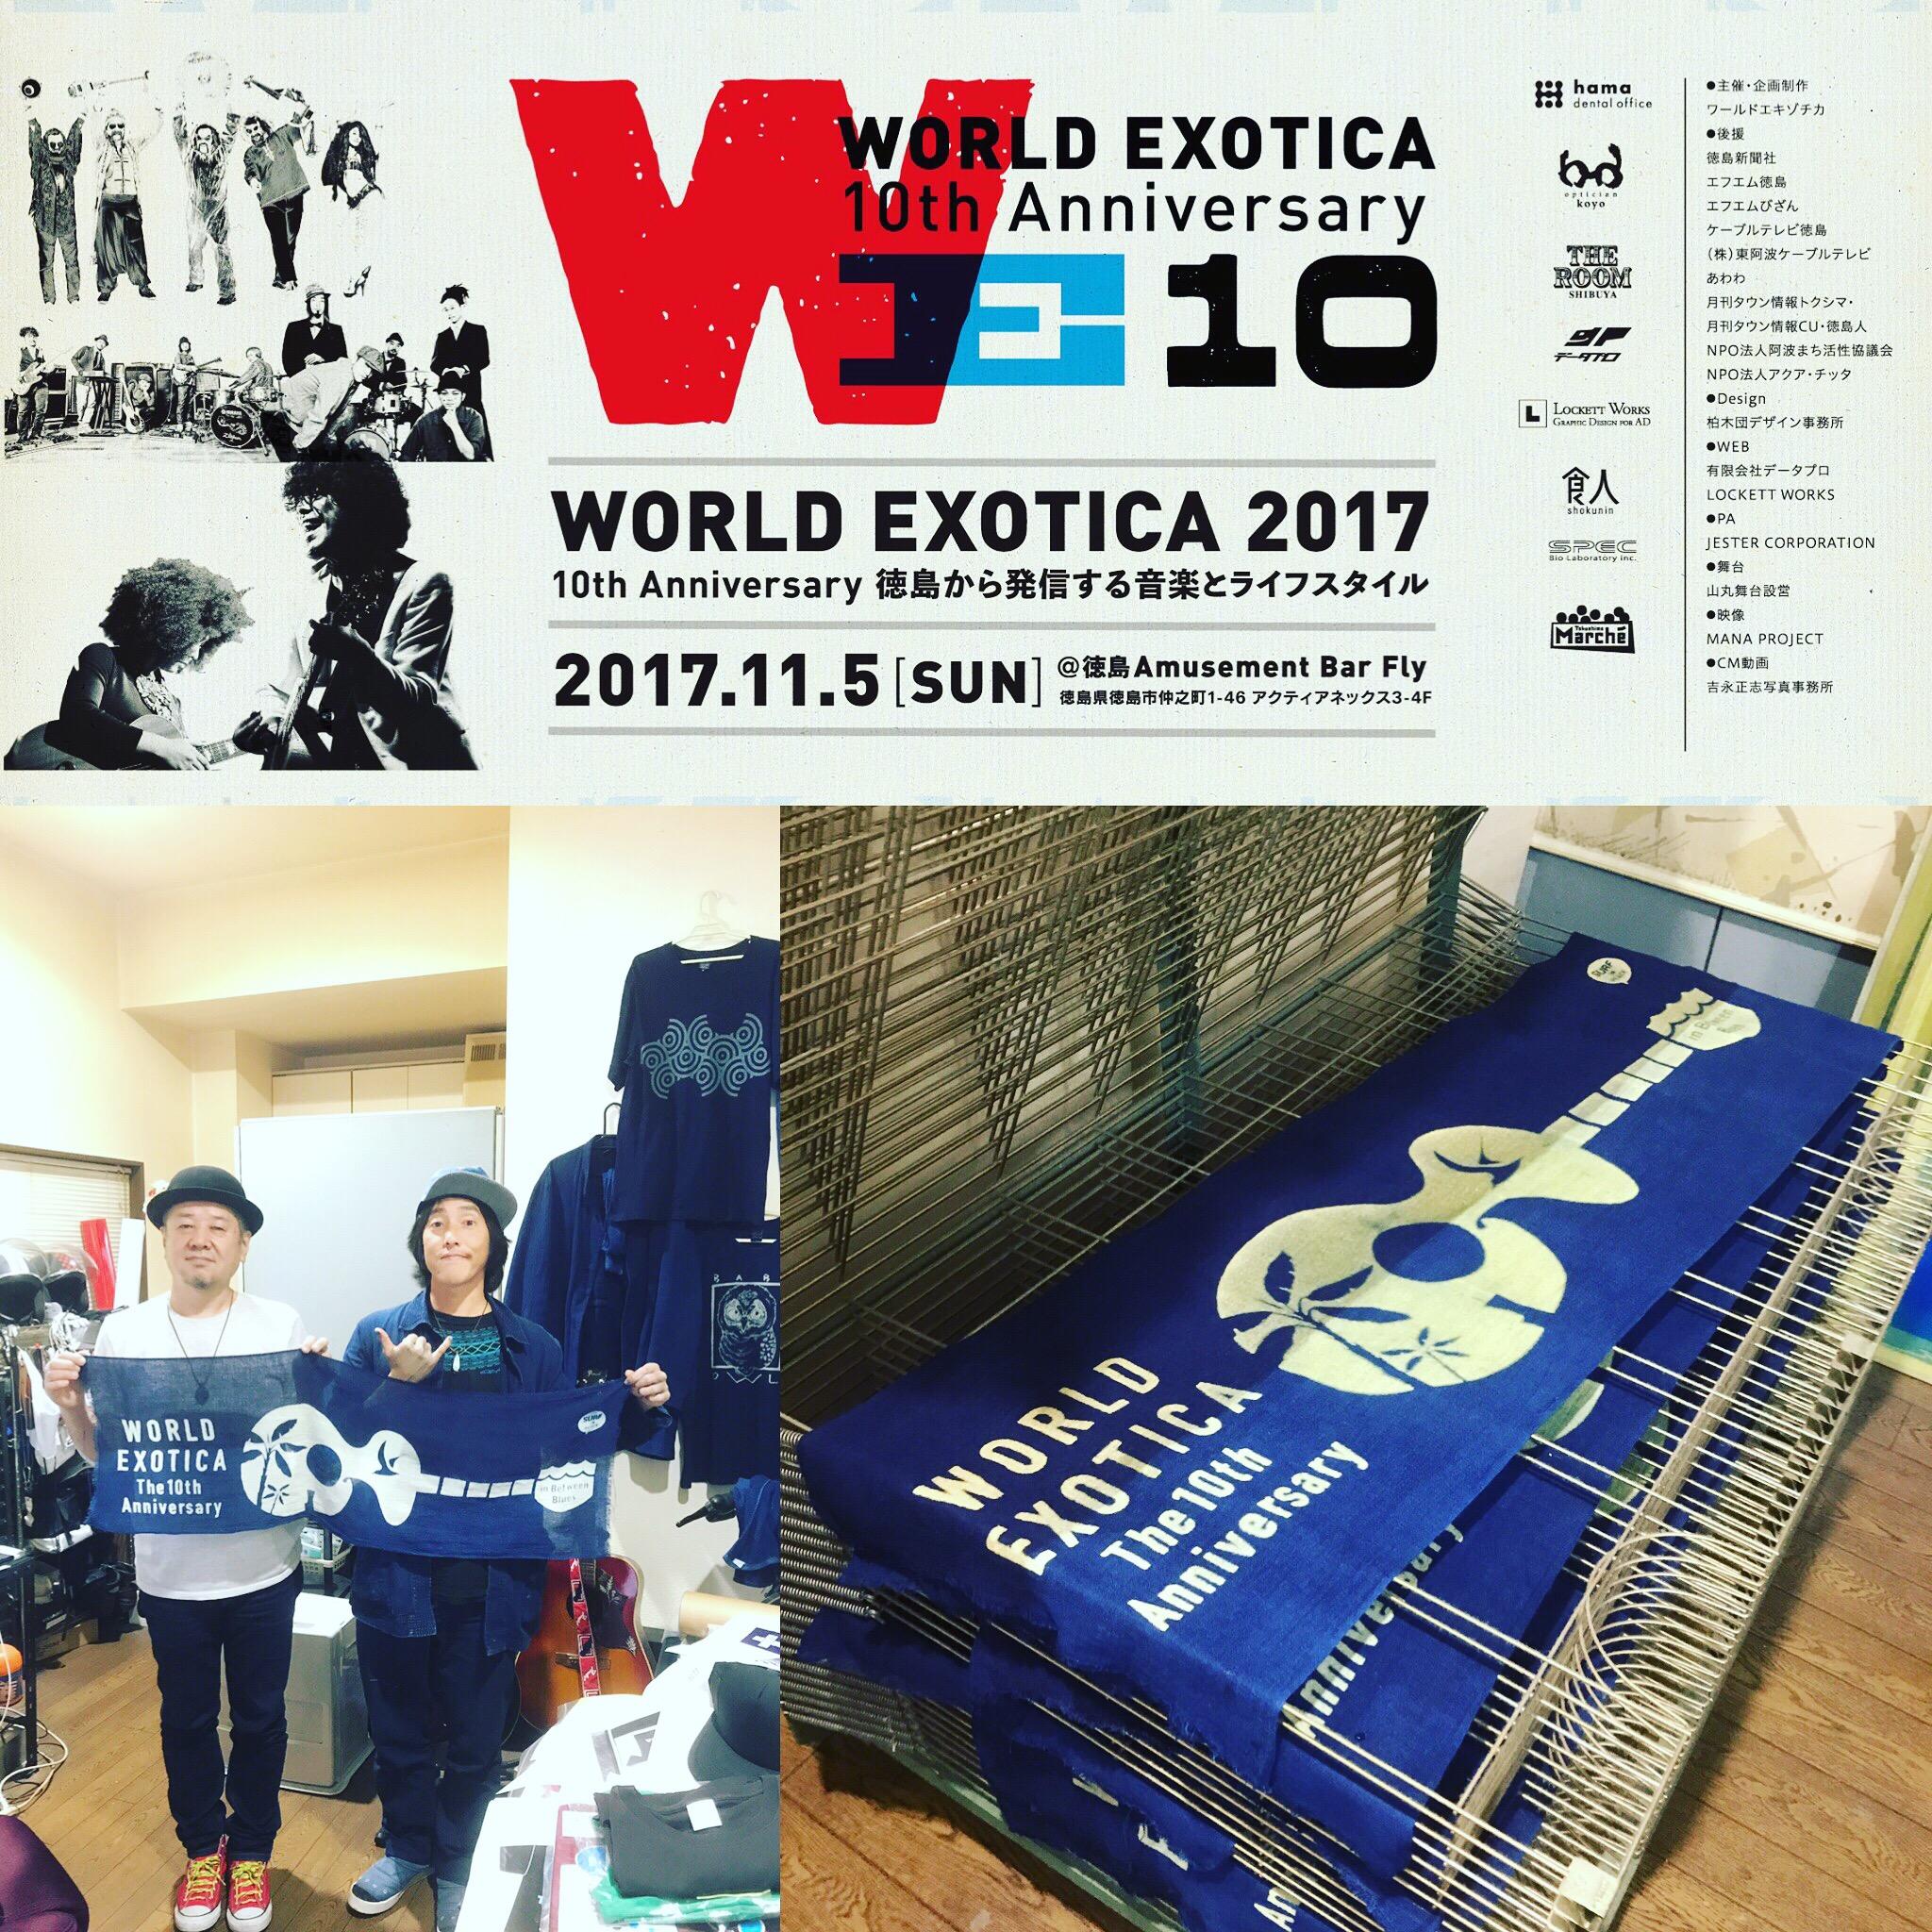 WE10thAnv記念藍染手拭い完成*